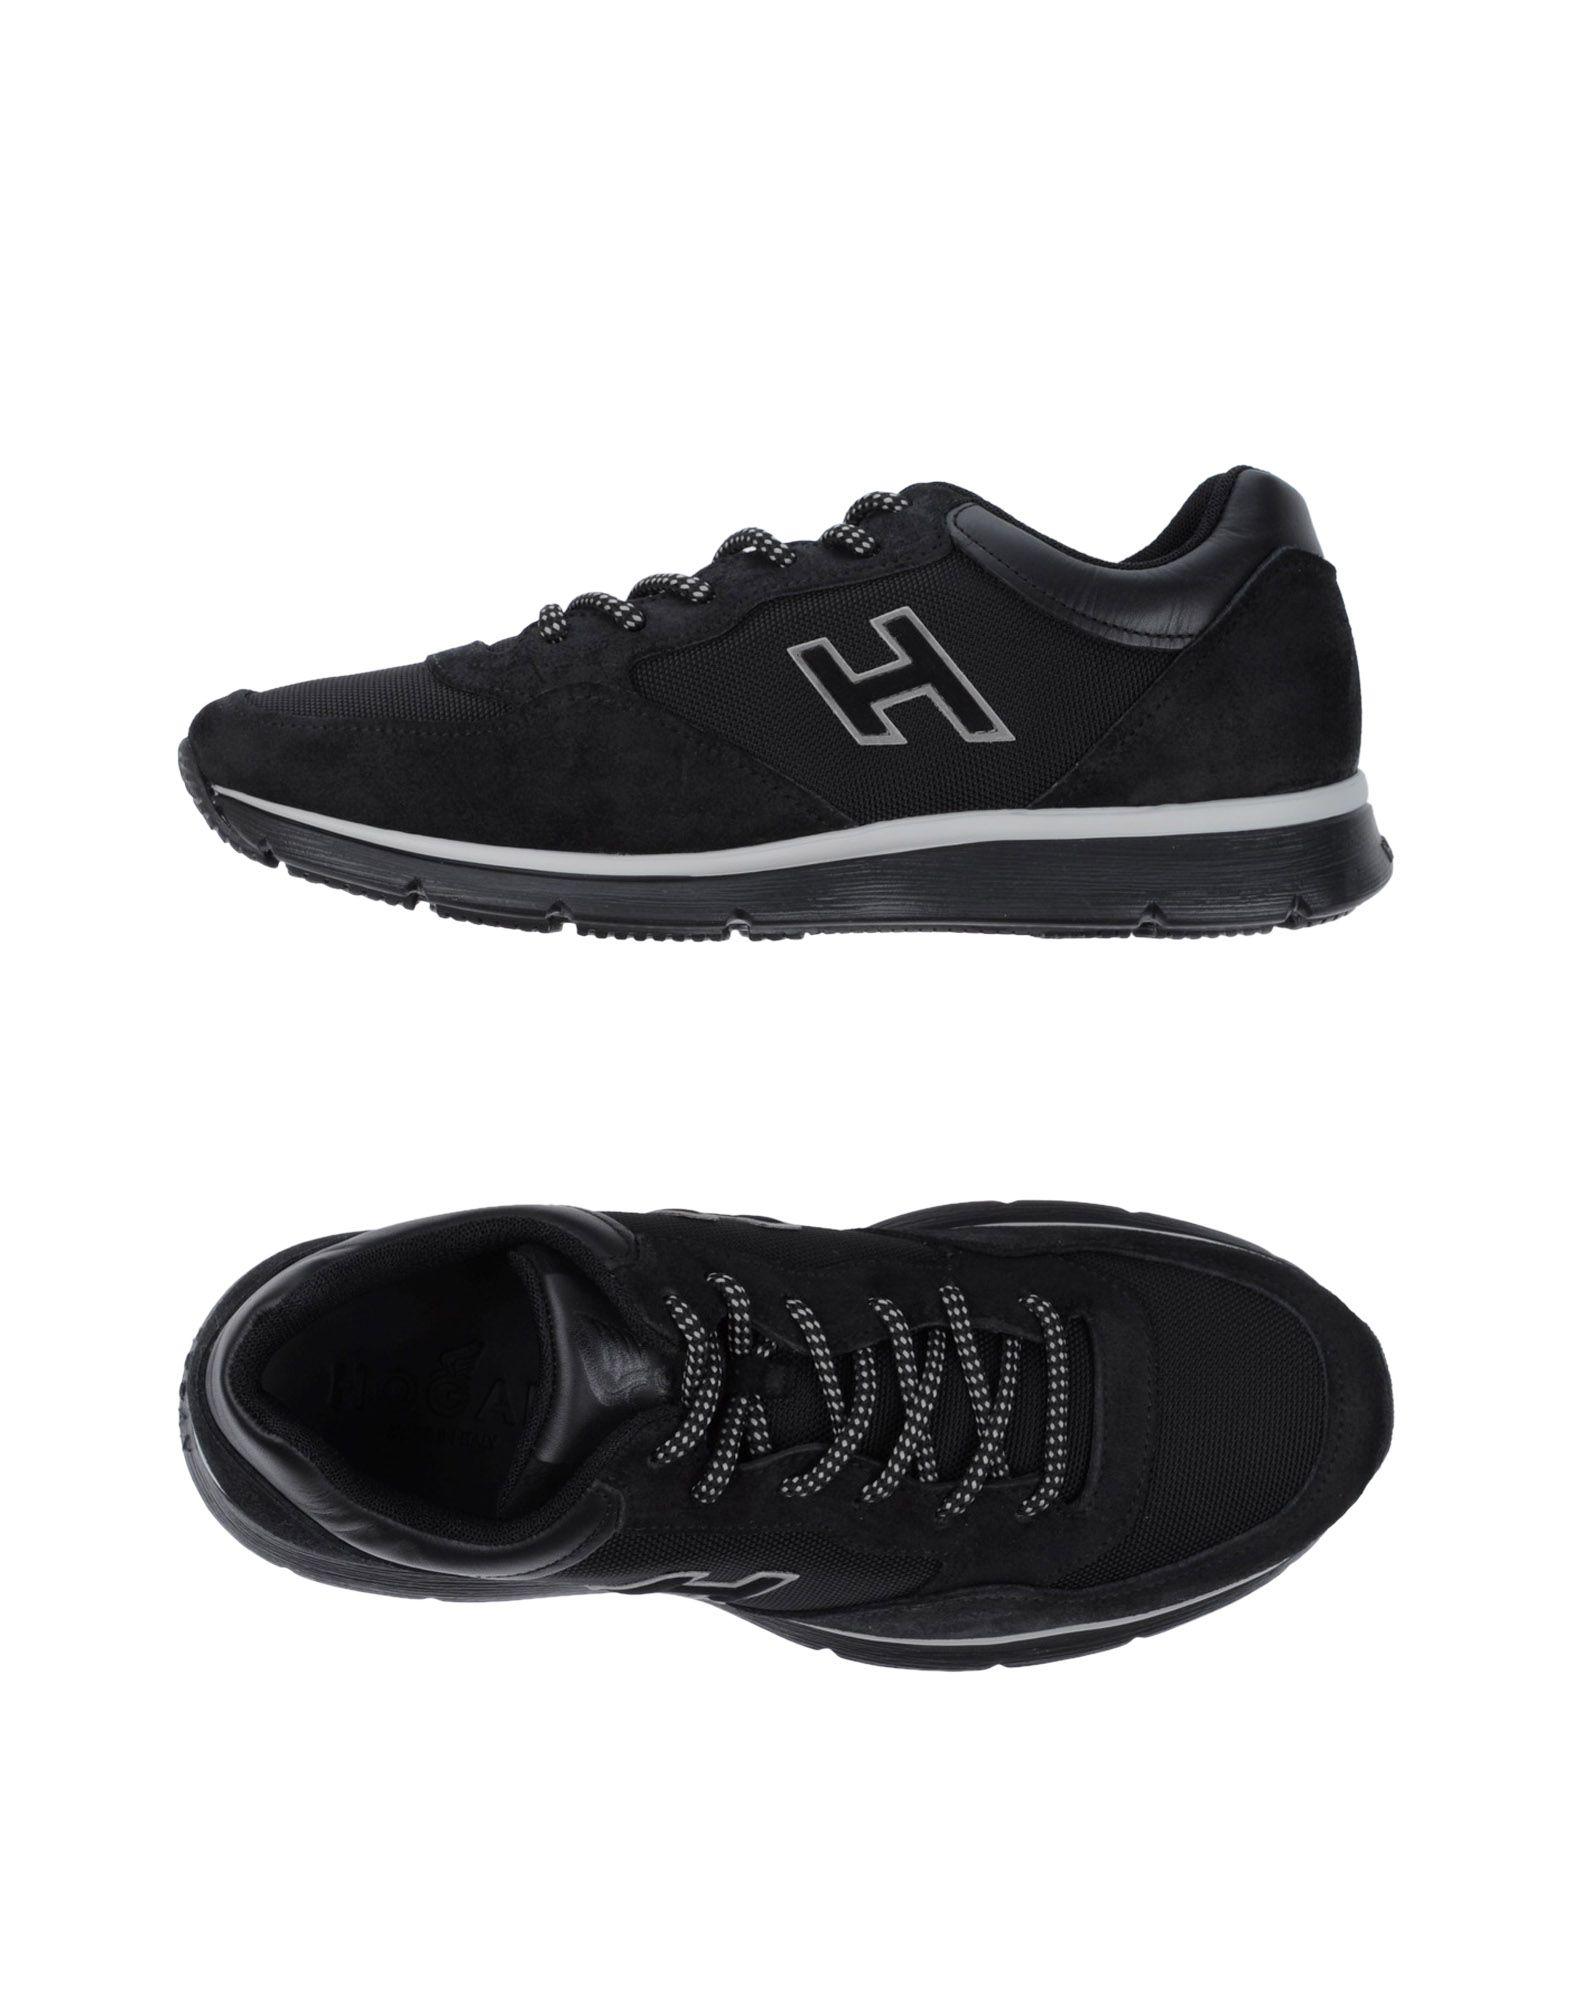 Hogan Sneakers Herren  11300243WW Gute Qualität beliebte Schuhe